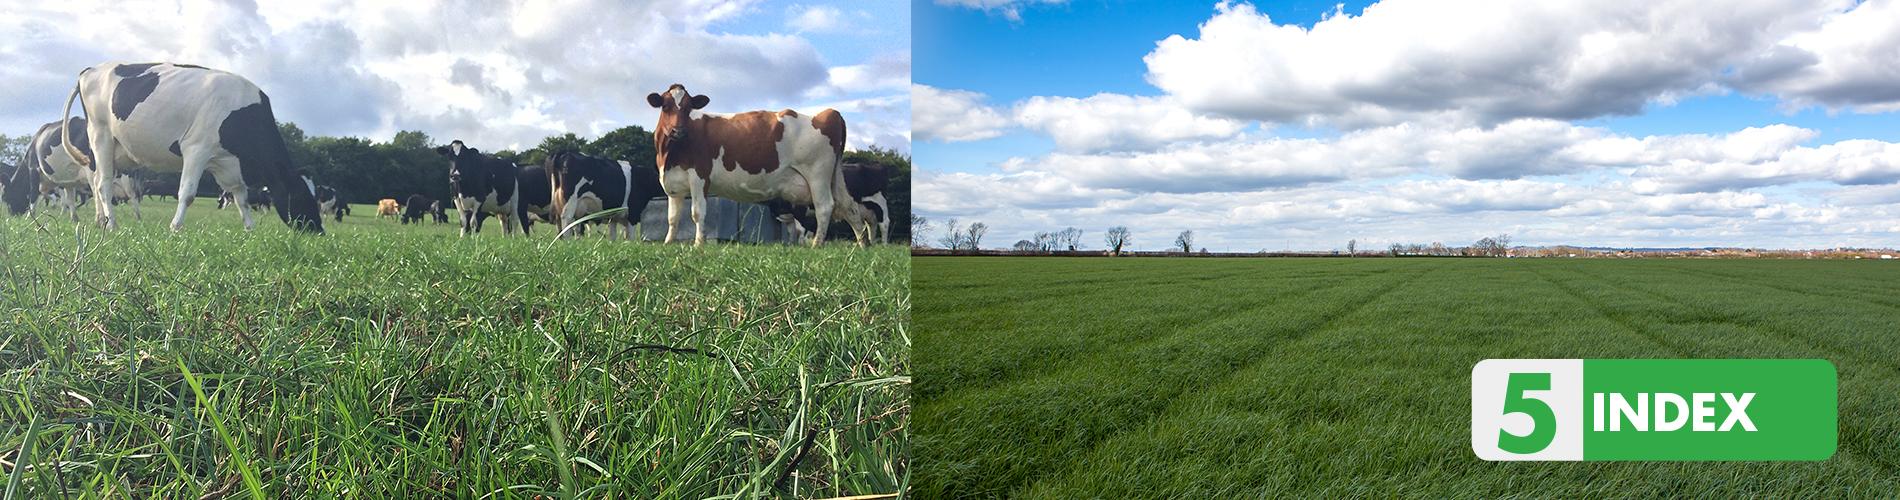 farming advice good grass guide index 5Index_5 #19